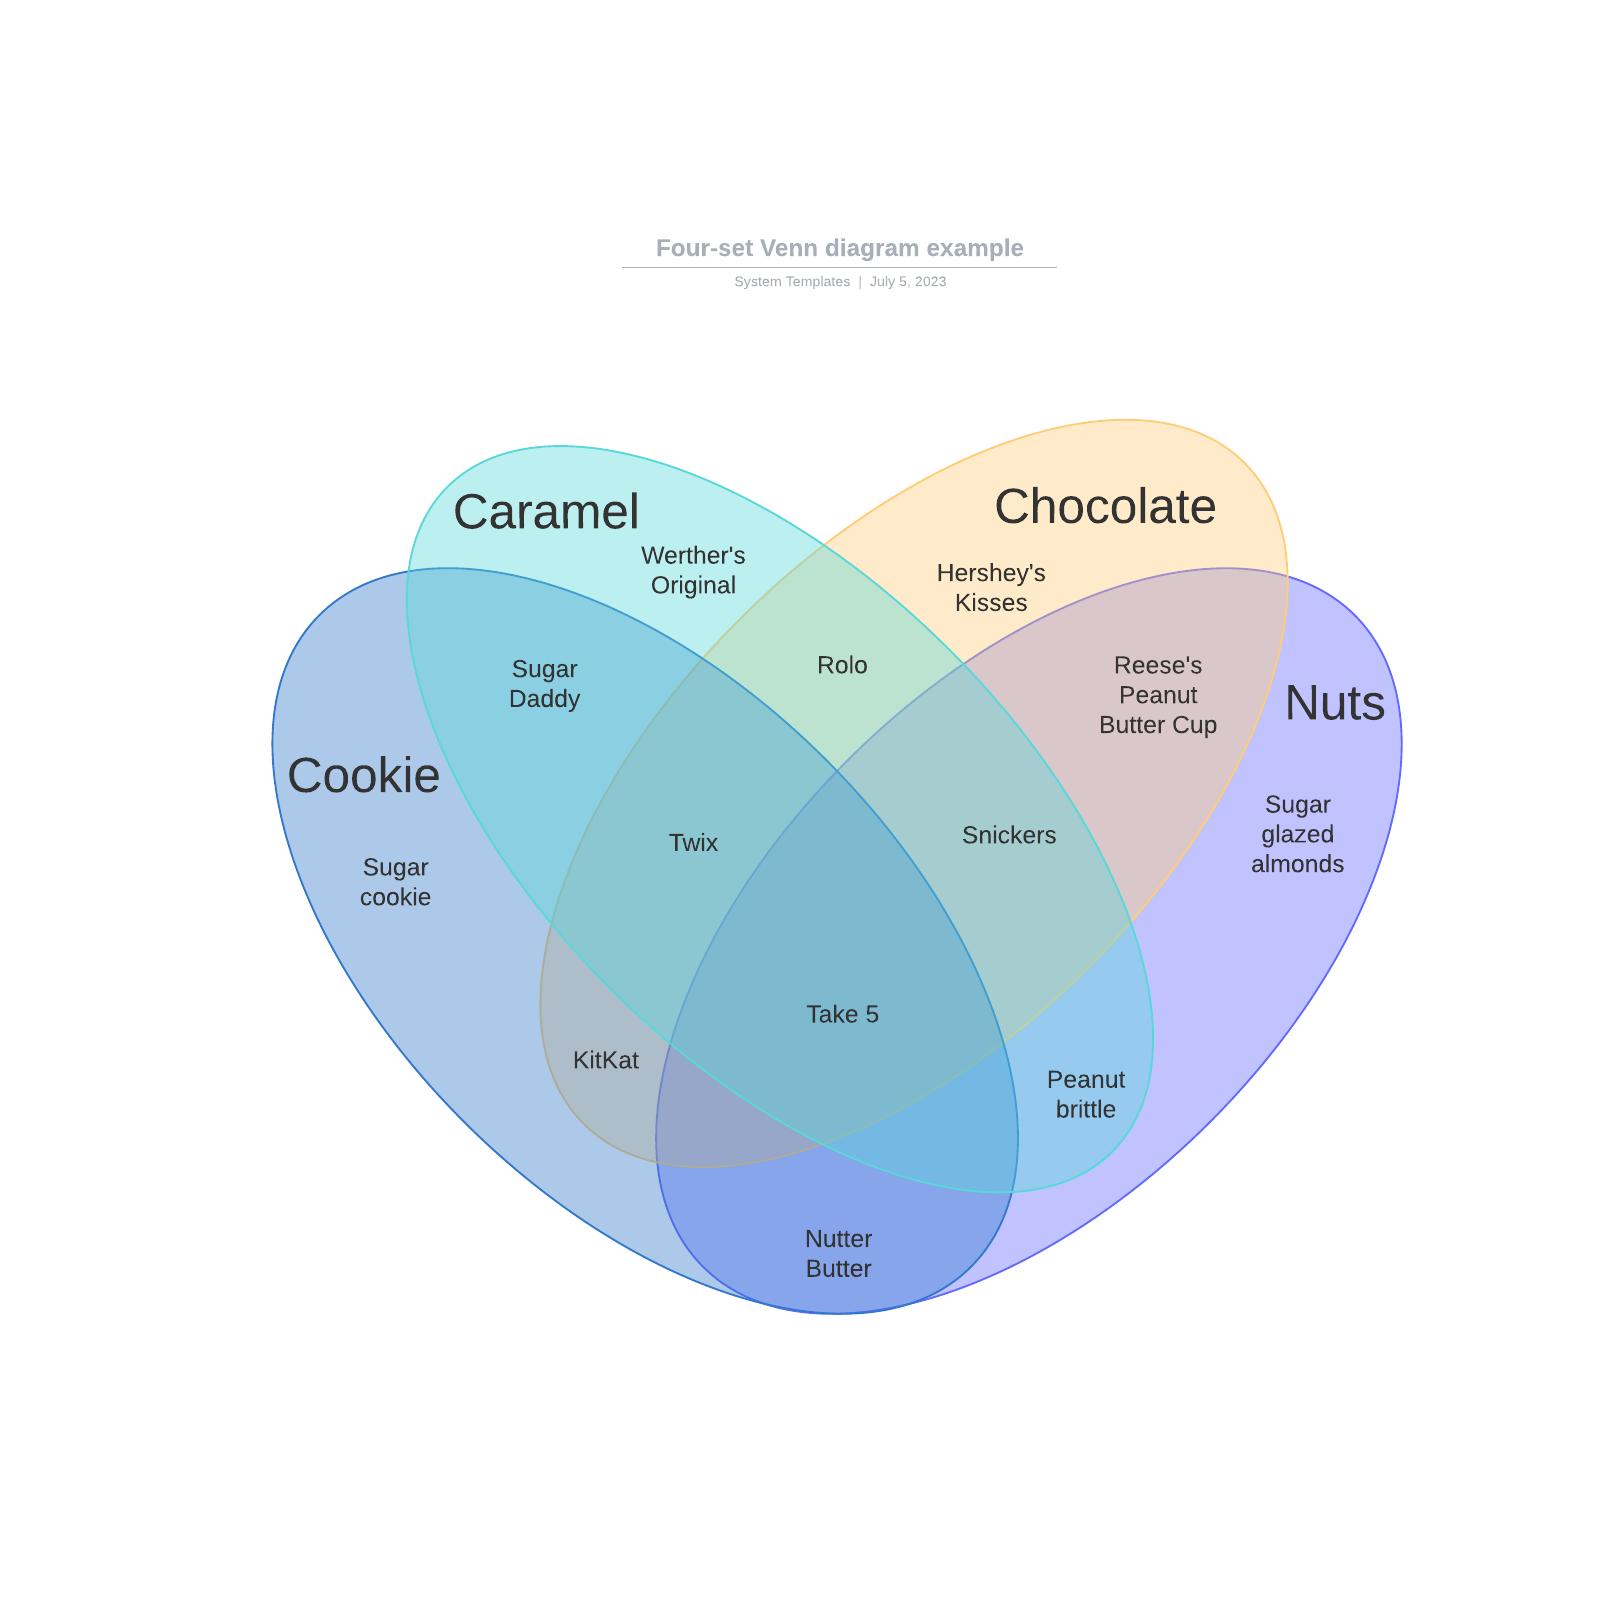 Four-set Venn diagram example